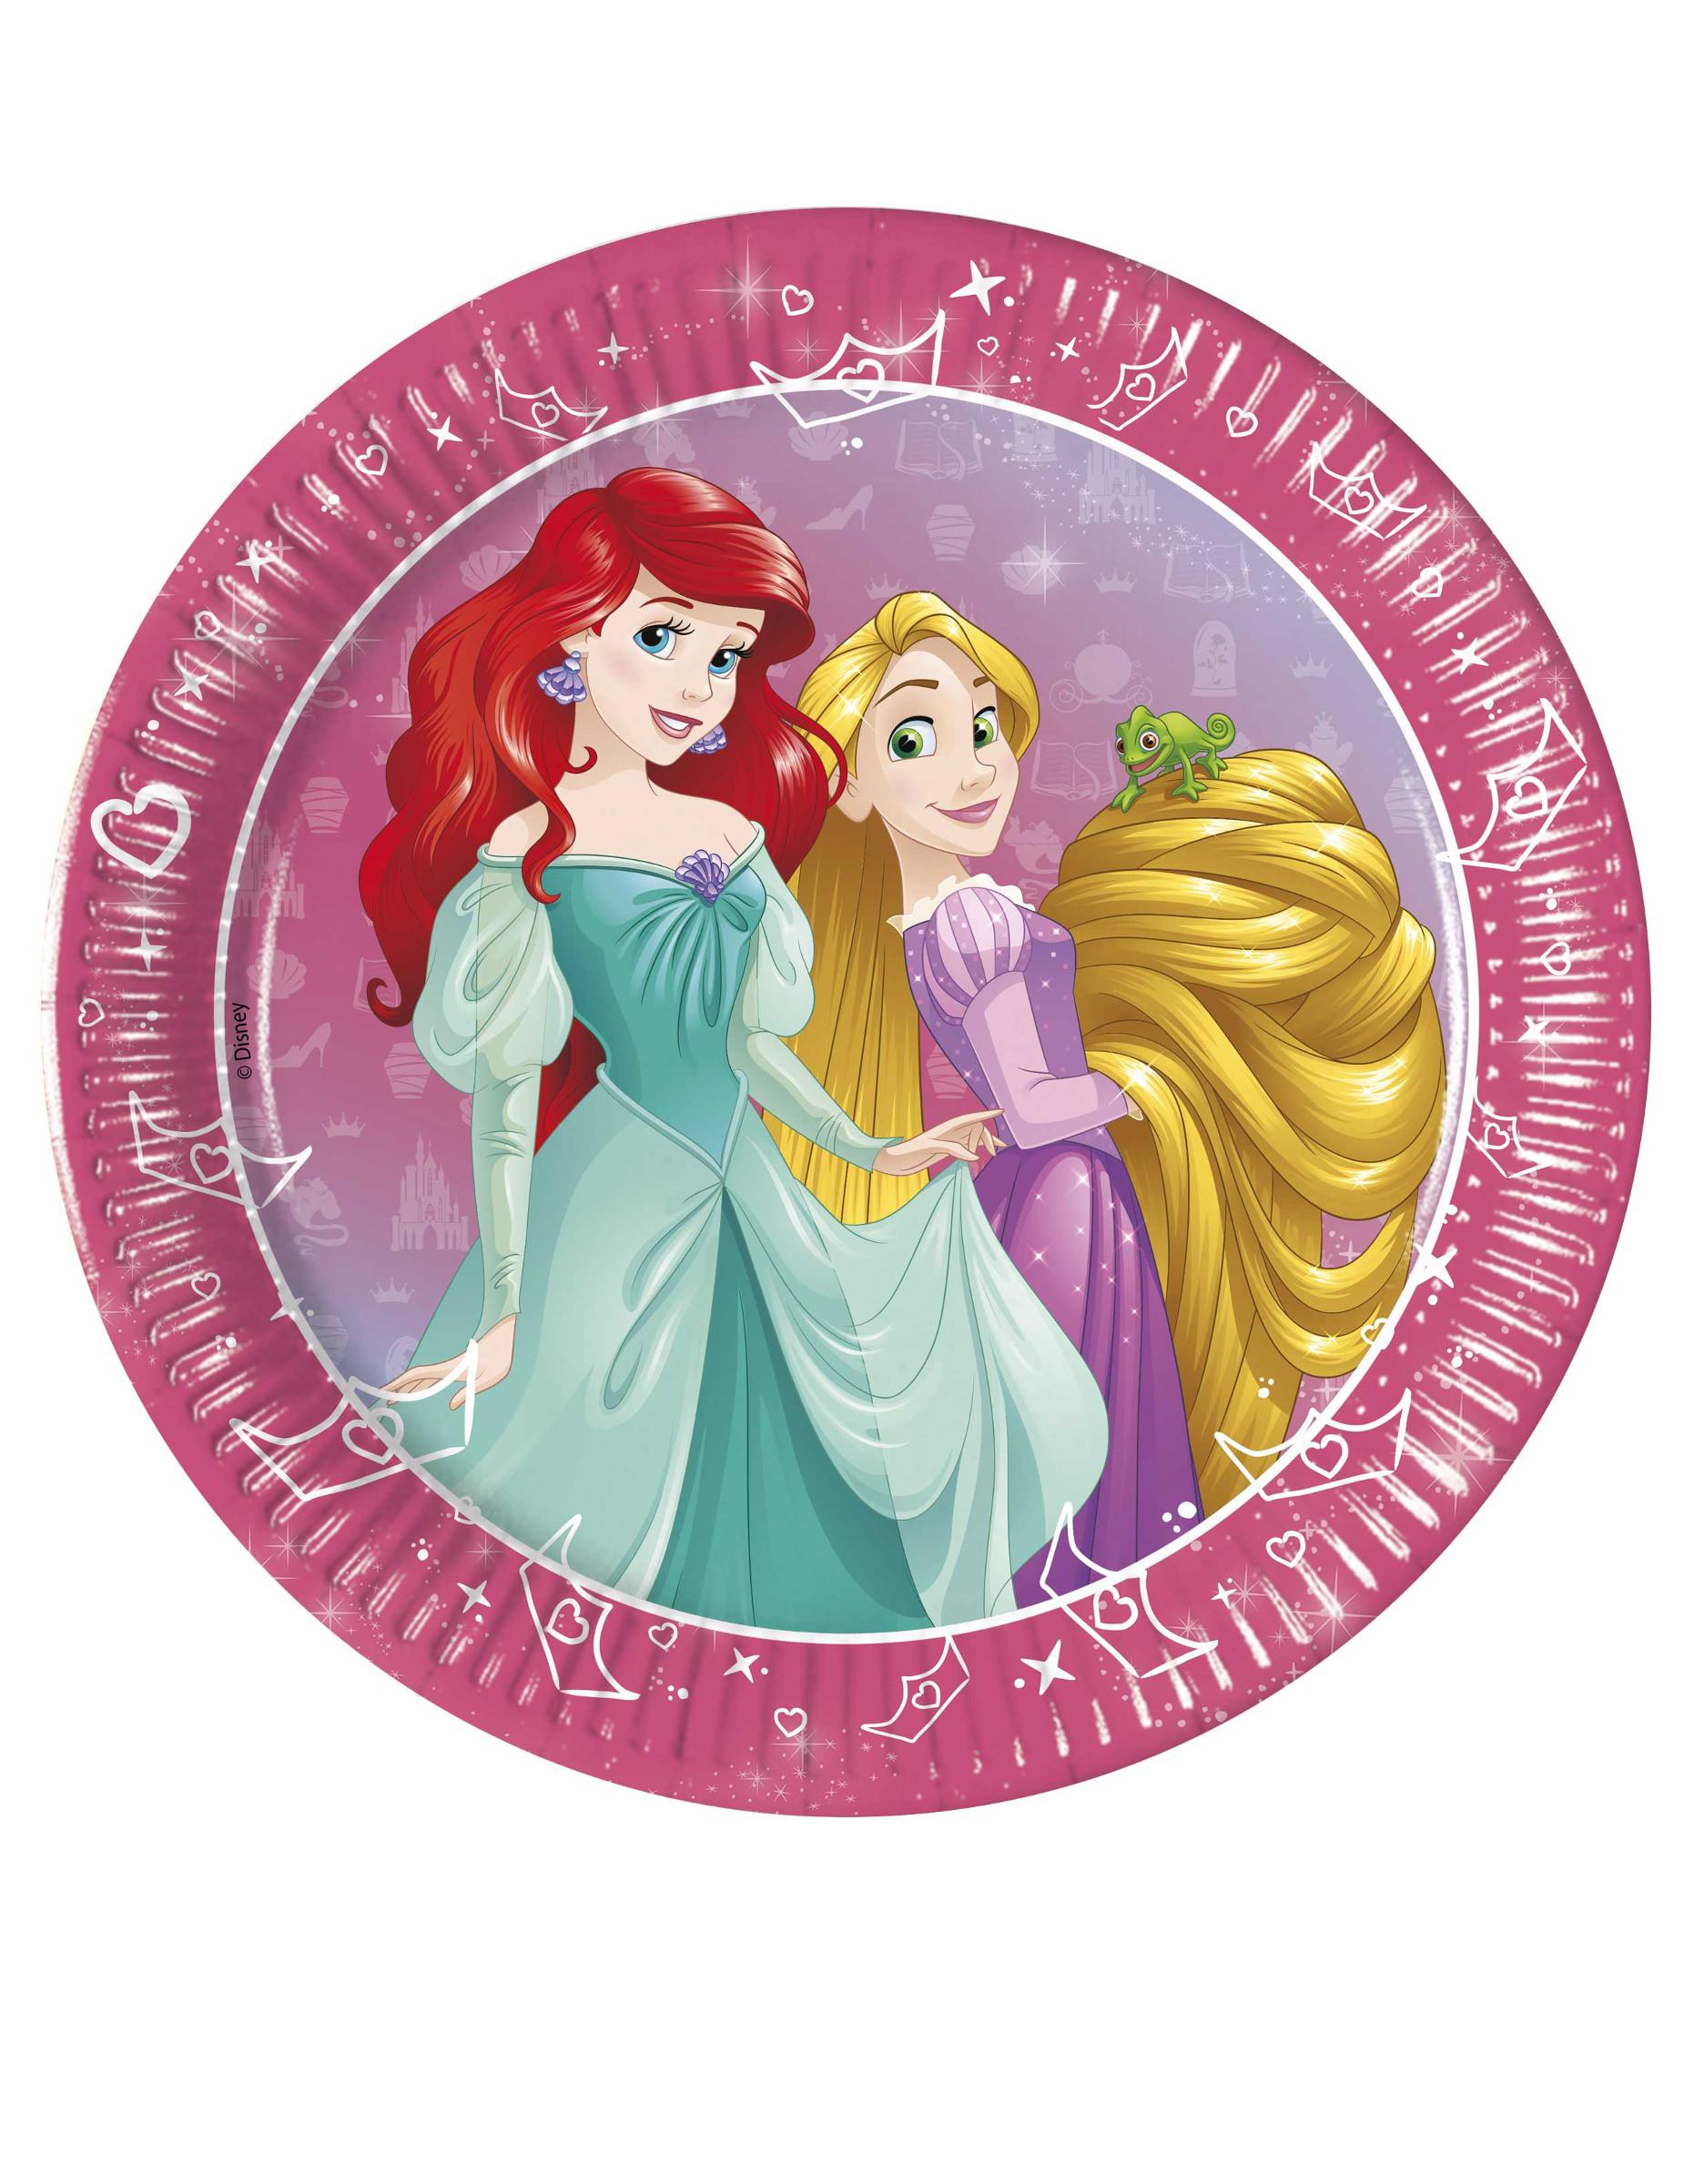 #Disney™-Pappteller Prinzessinnen 8 Stück bunt 20cm#